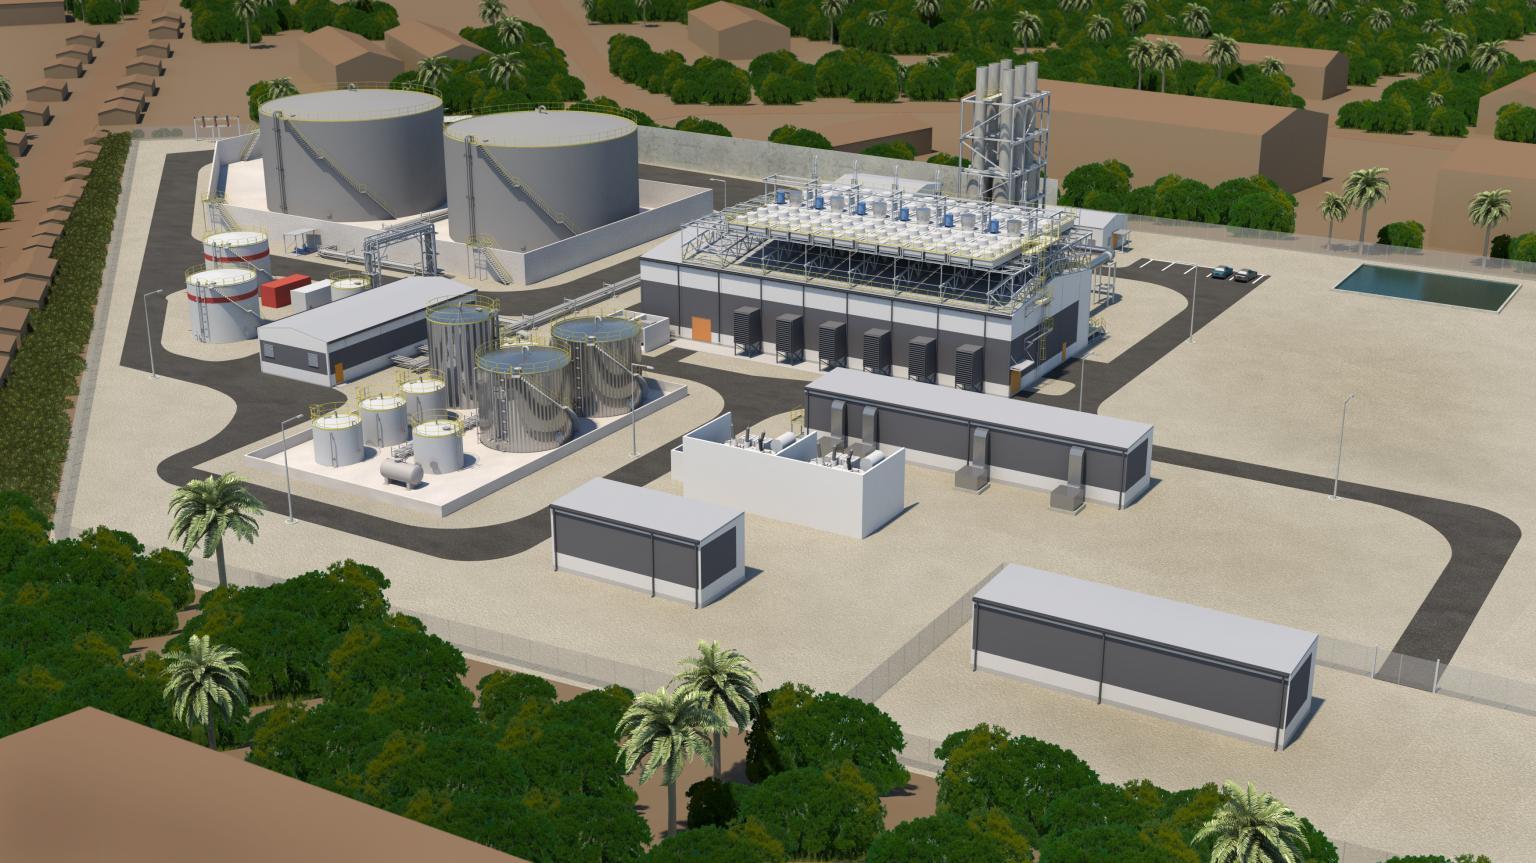 The 57 MW Wärtsilä Power Plant in Freetown, Sierra Leone